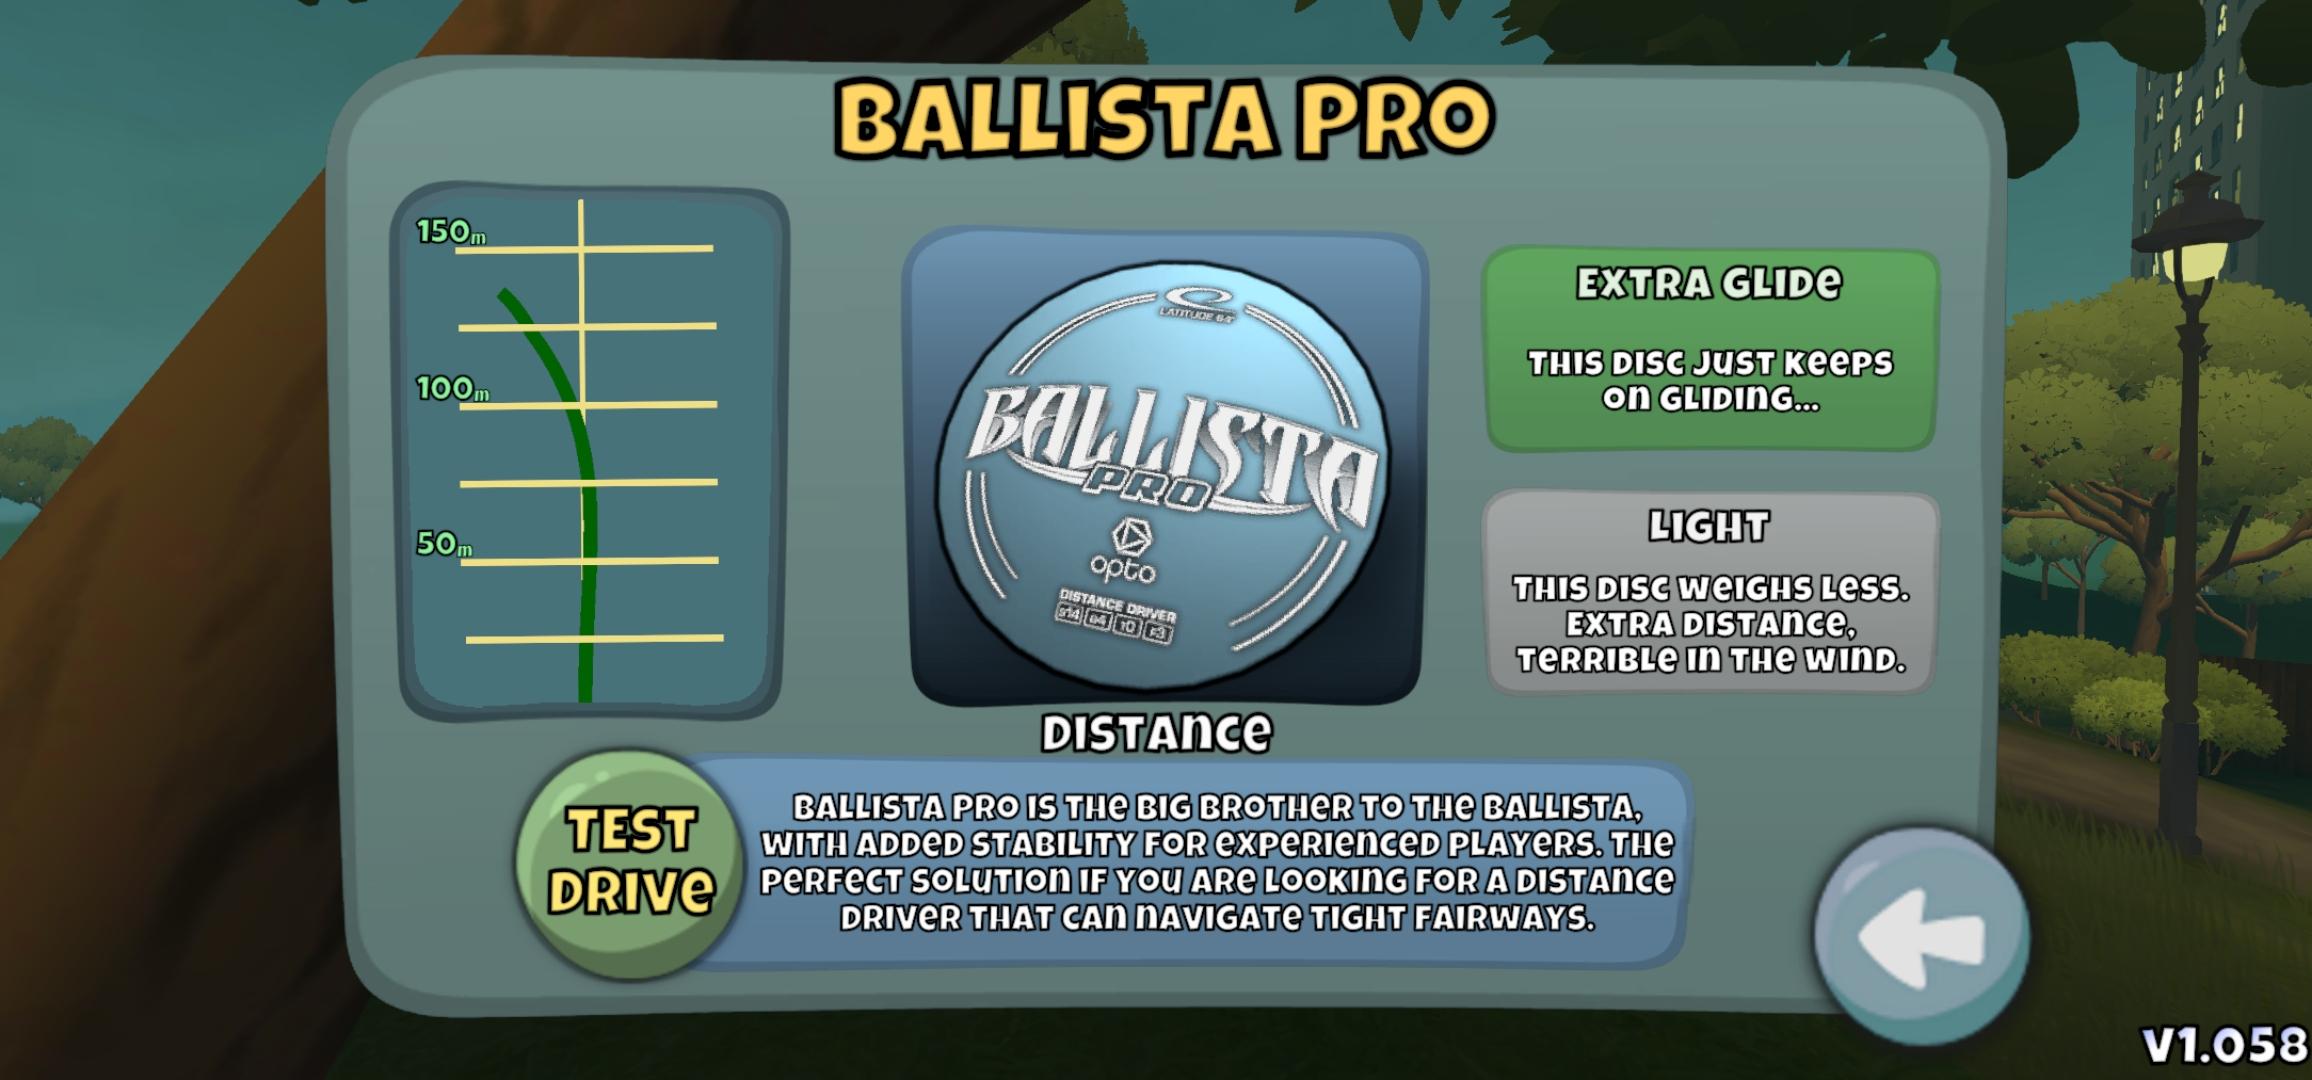 Best Distance Driver in Disc Golf Valley - The Ballista Pro Extra glide-Light